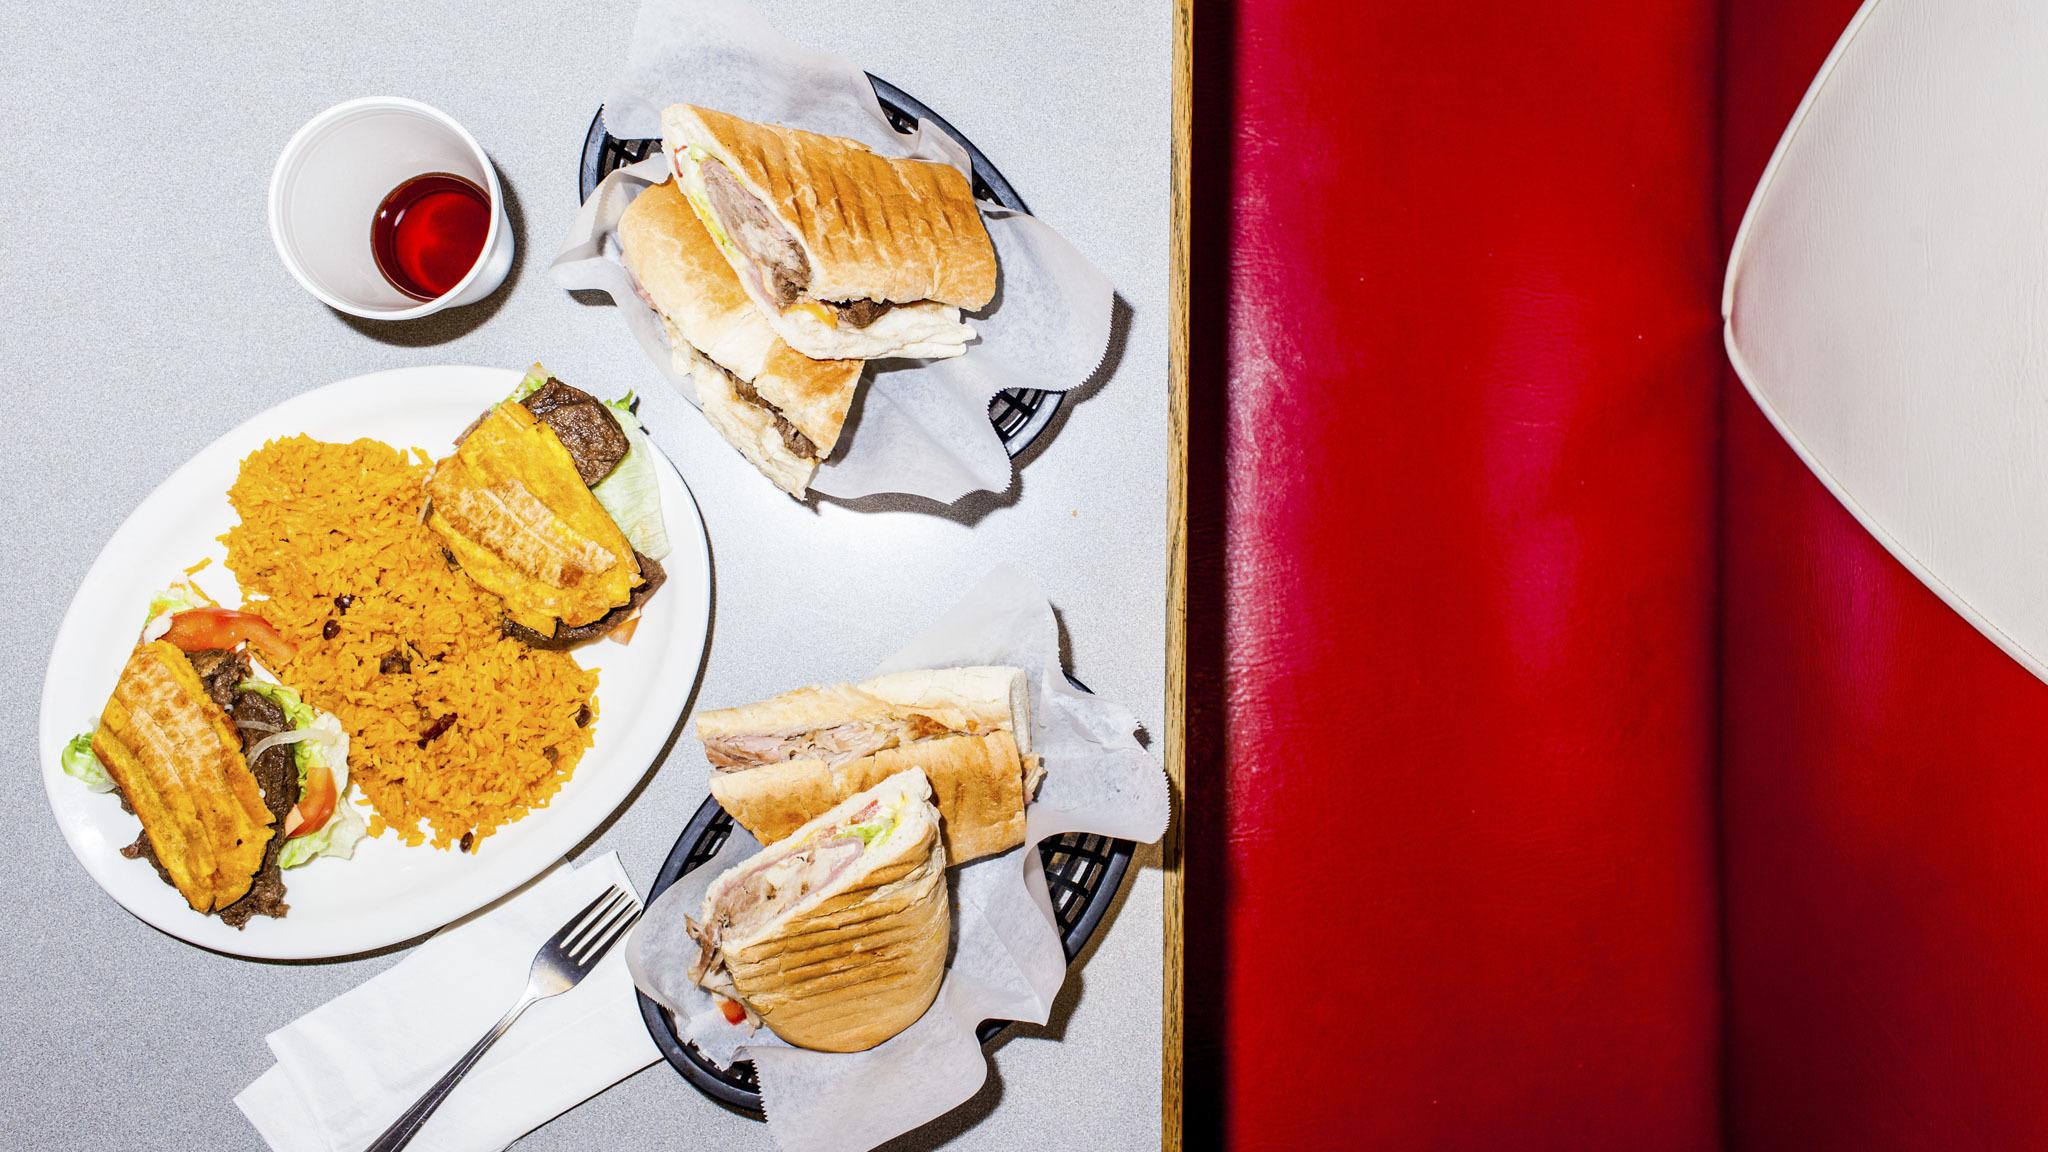 diana's food & restaurant